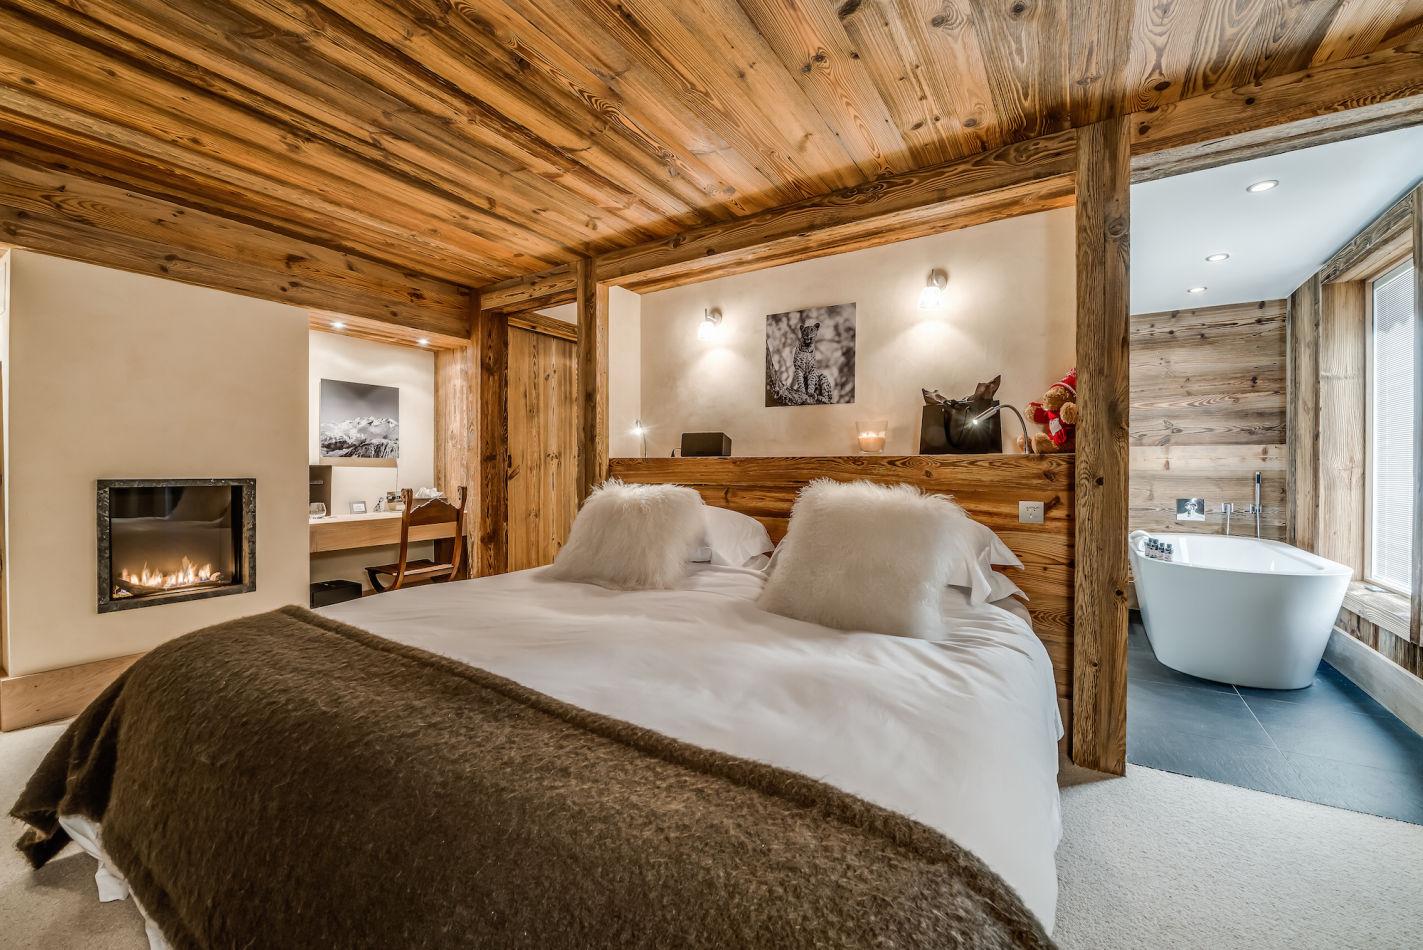 mont-tremblant-bedroom-3-ensuite